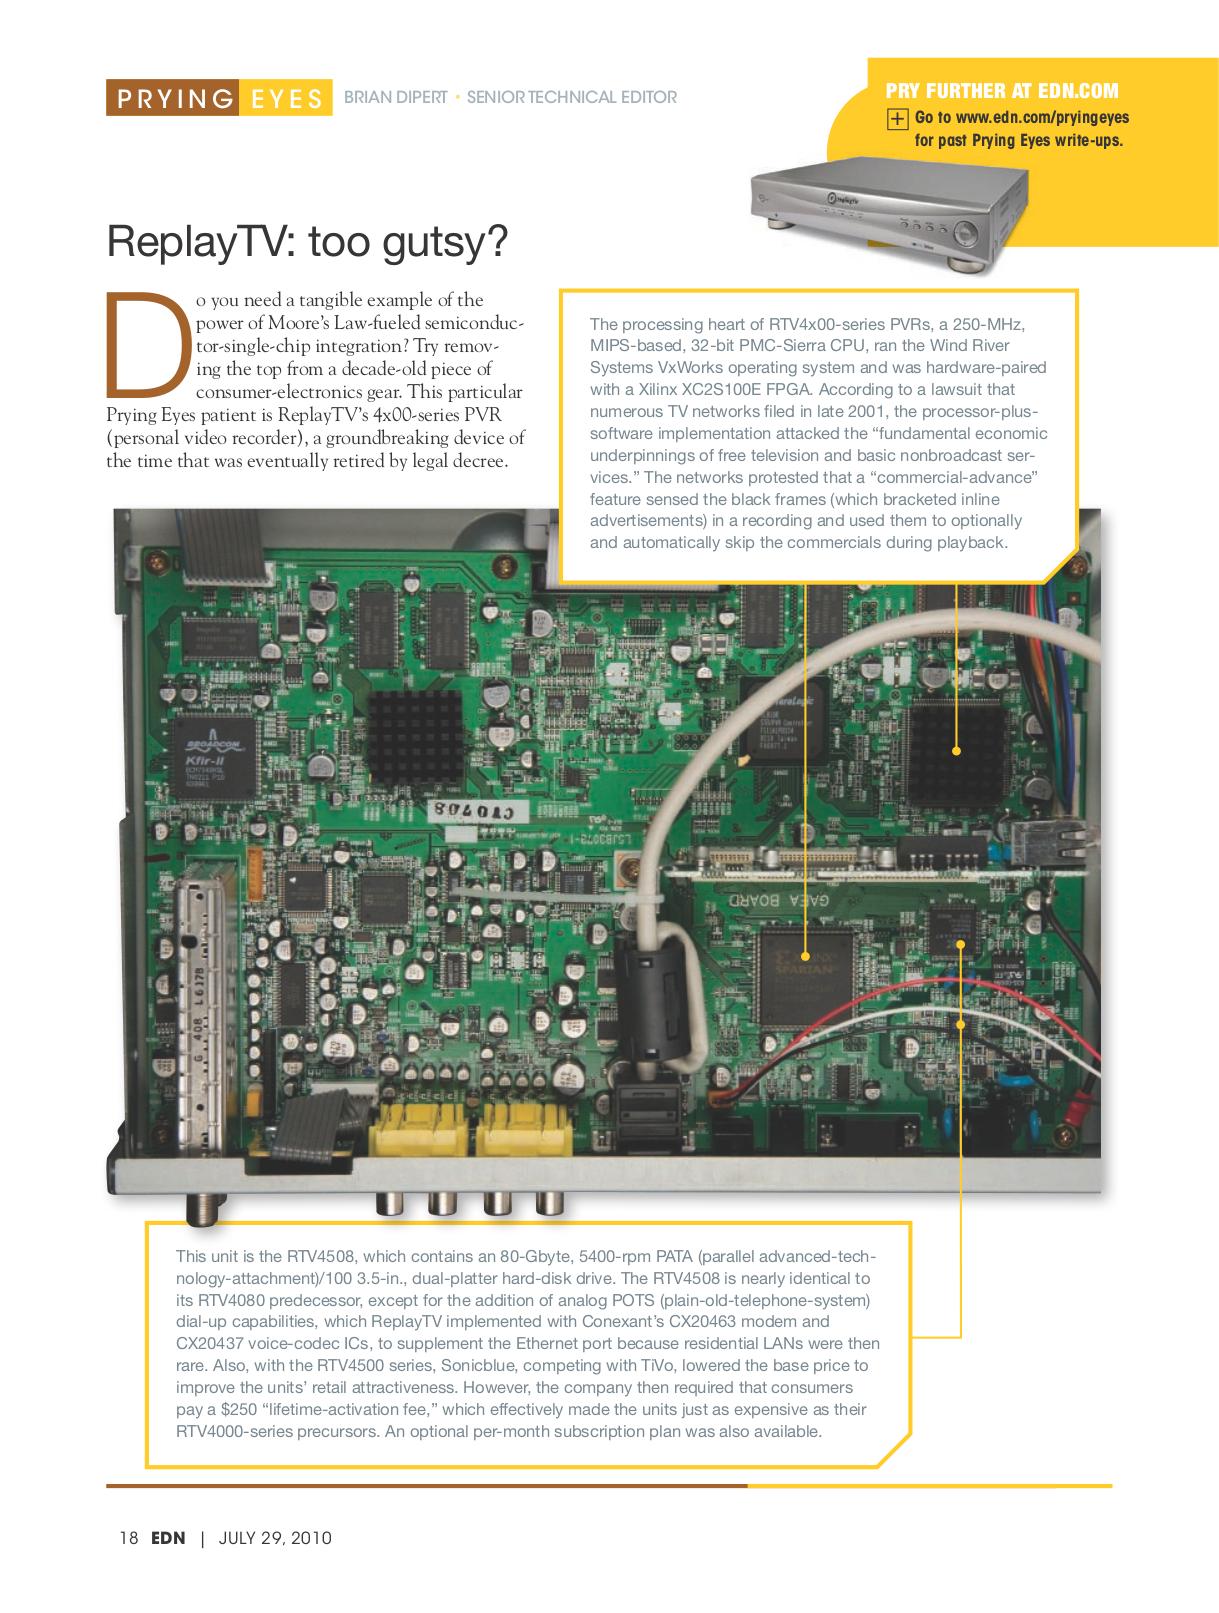 pdf for ReplayTV DVR RTV4508 manual